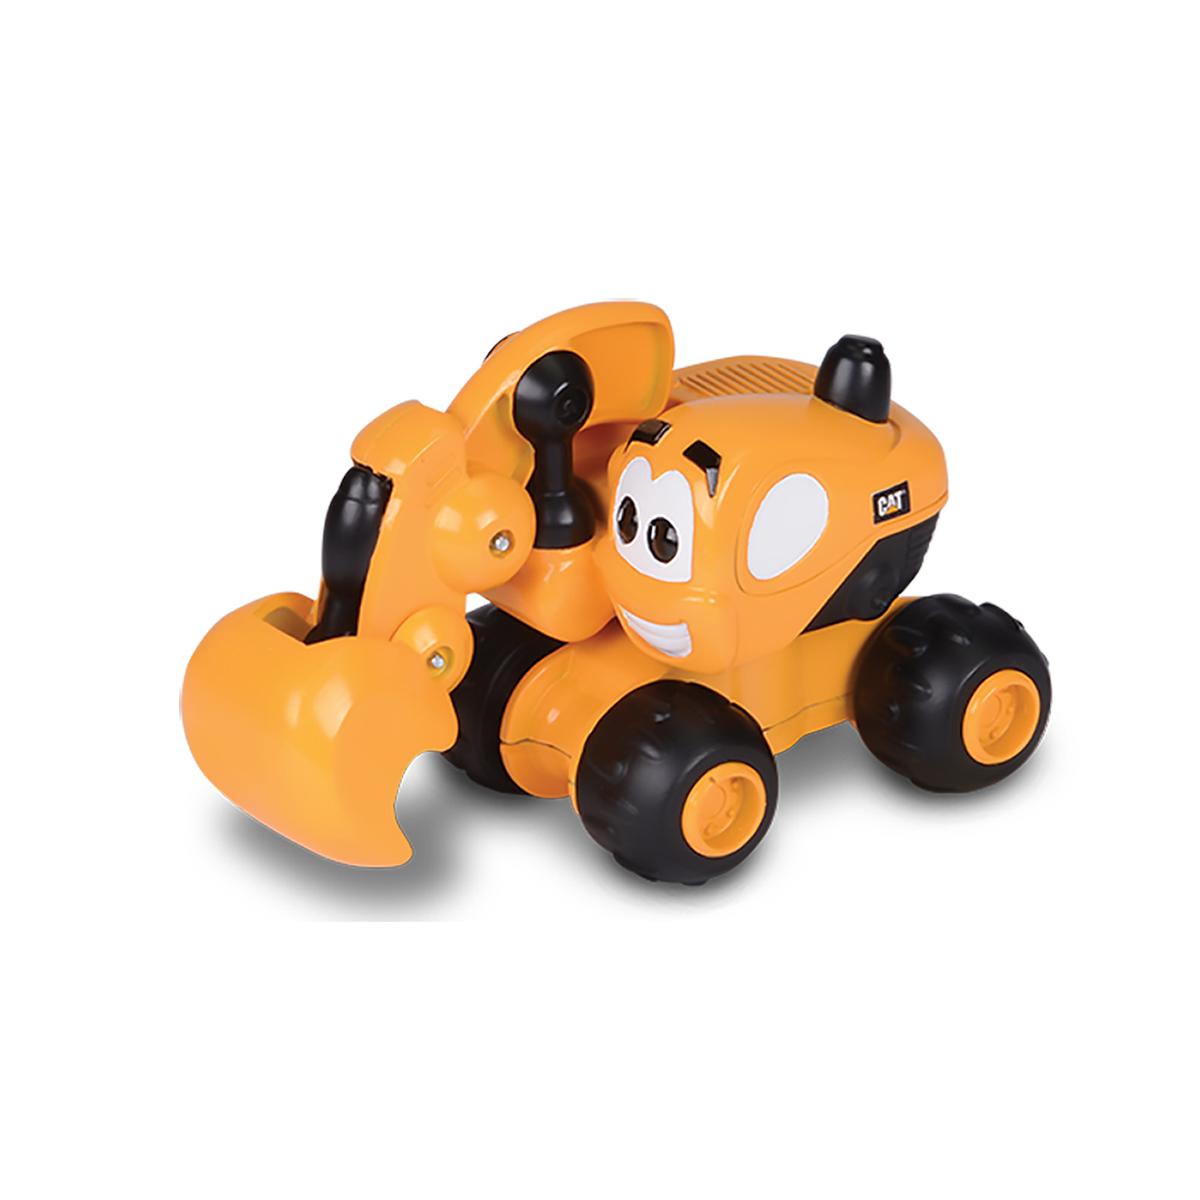 excavator toy state cat buildin' crew wigglers - diggin' dave